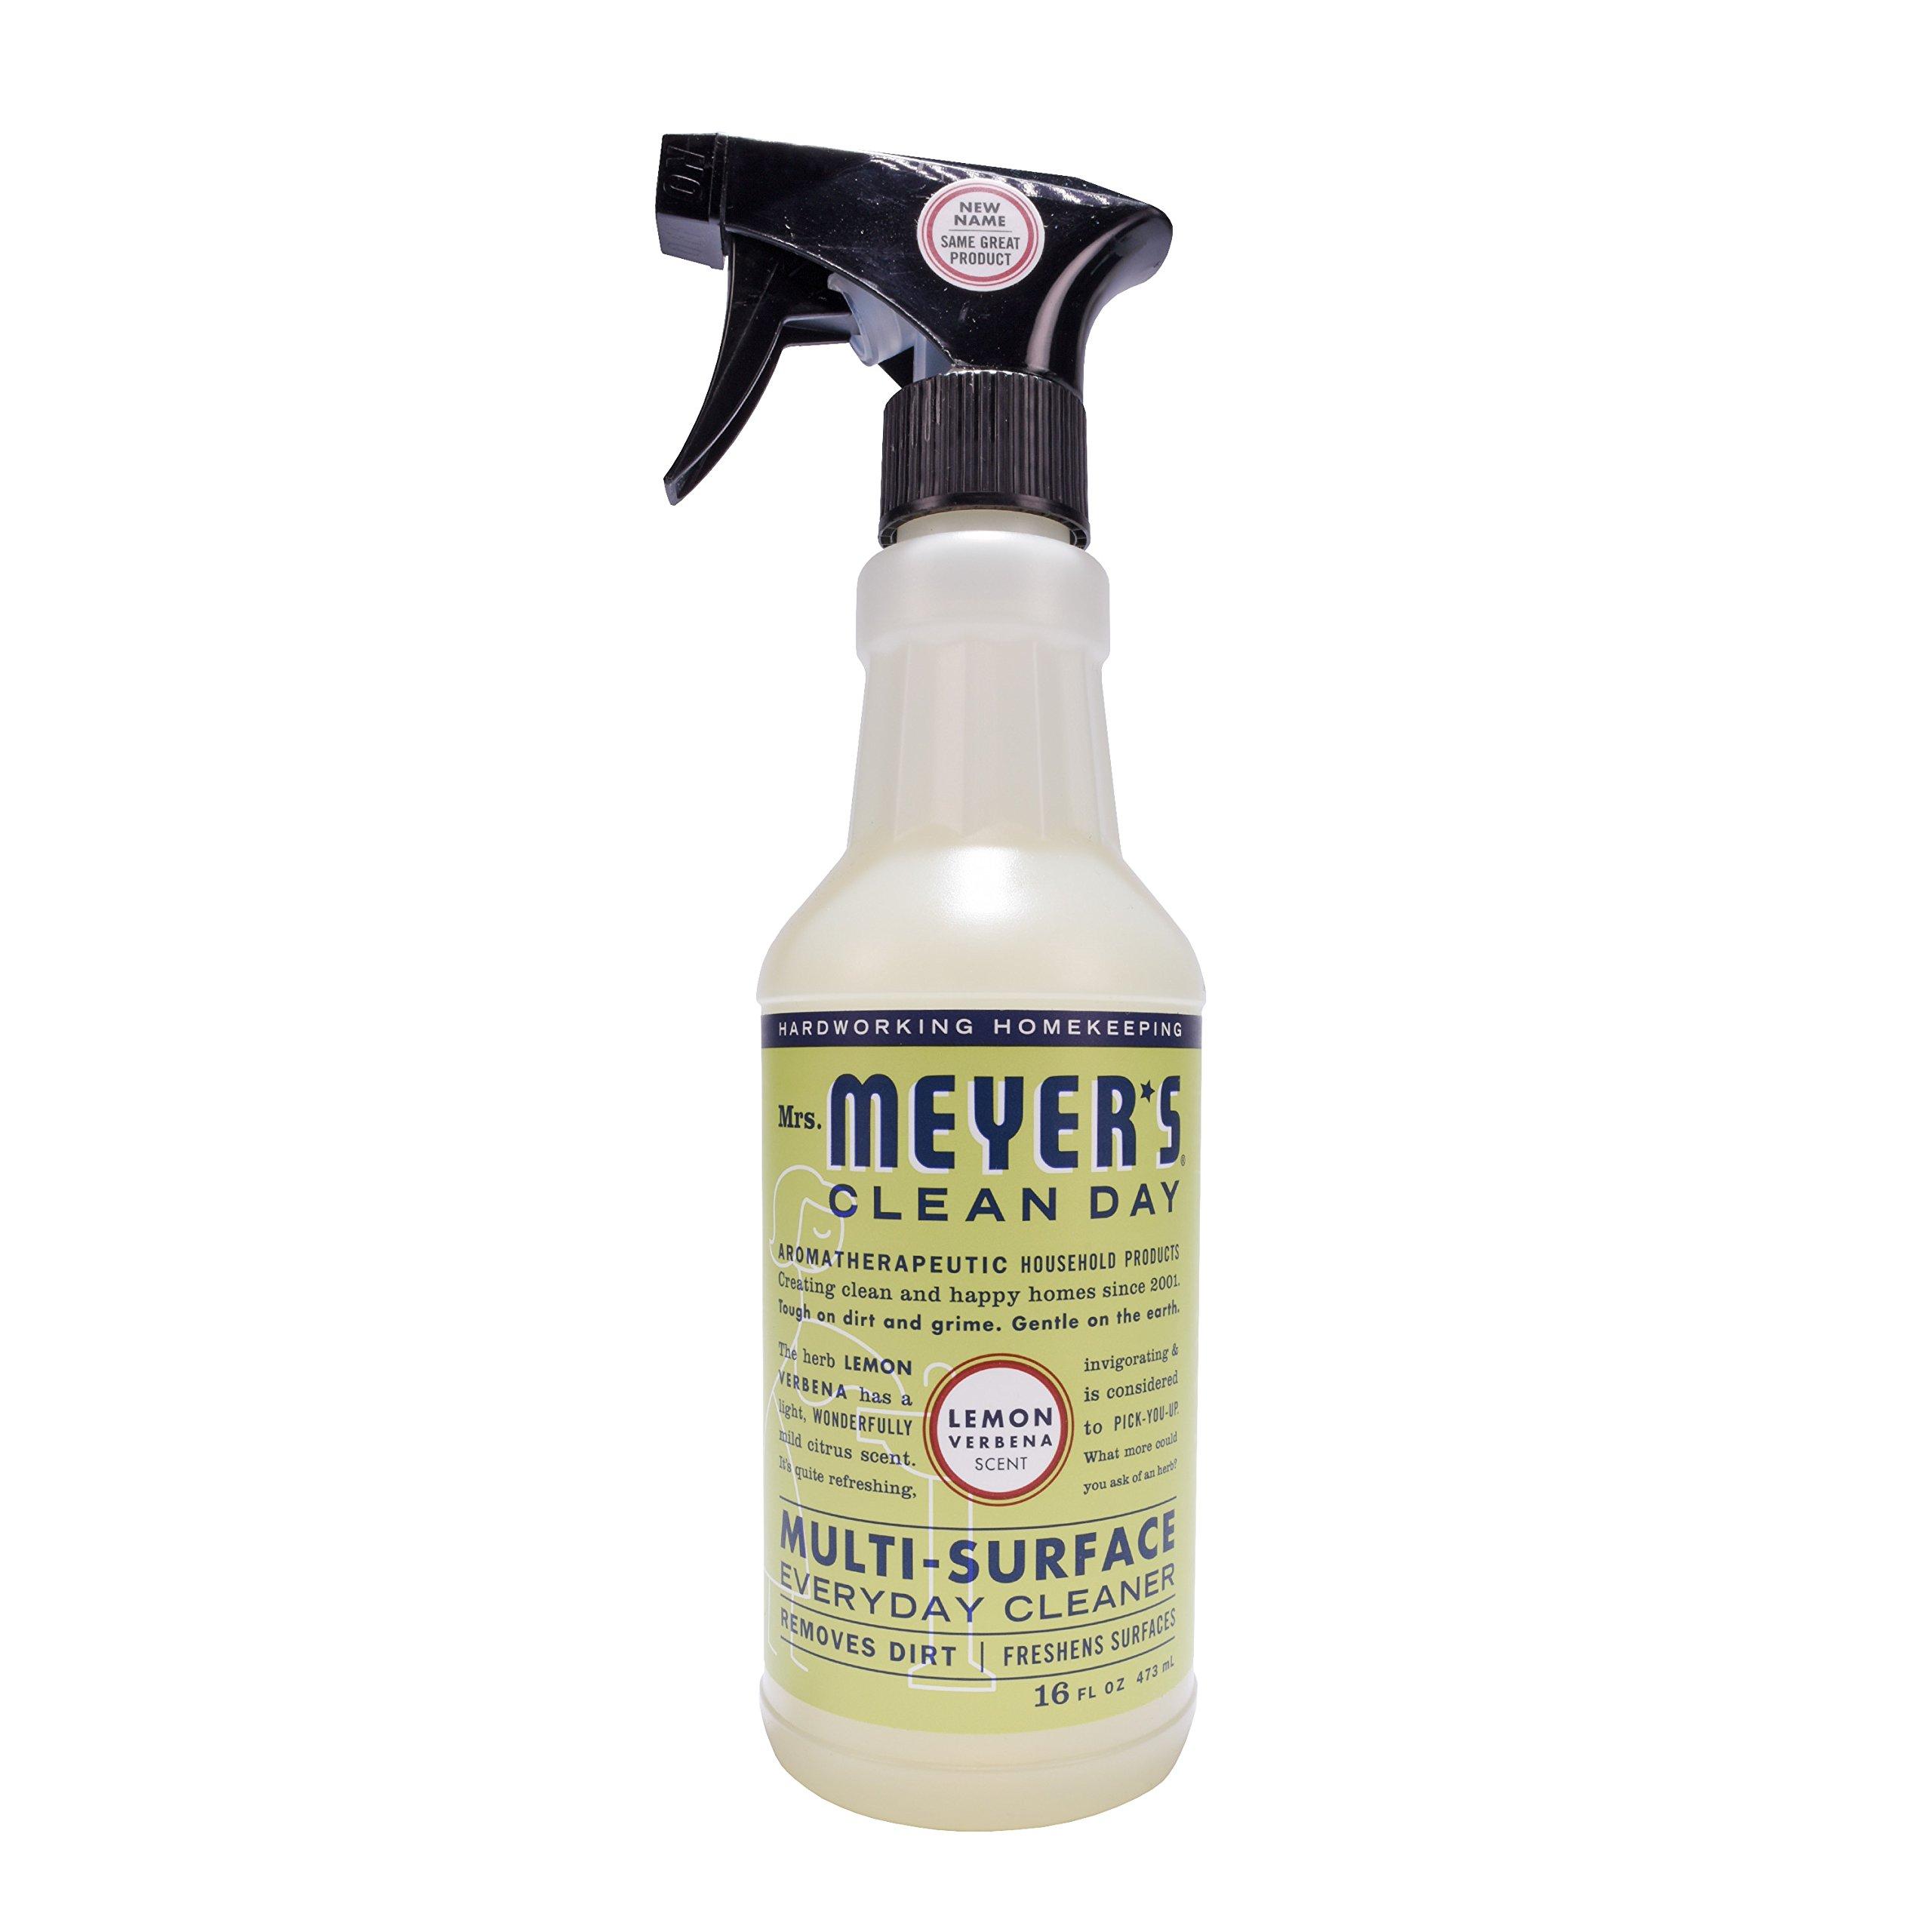 Mrs. Meyer's Clean Day Kitchen Basics Set, Lemon Verbena, 3 ct: Dish Soap (16 fl oz), Hand Soap (12.5 fl oz), Multi-Surface Everyday Cleaner (16 fl oz) by Mrs. Meyer's Clean Day (Image #10)